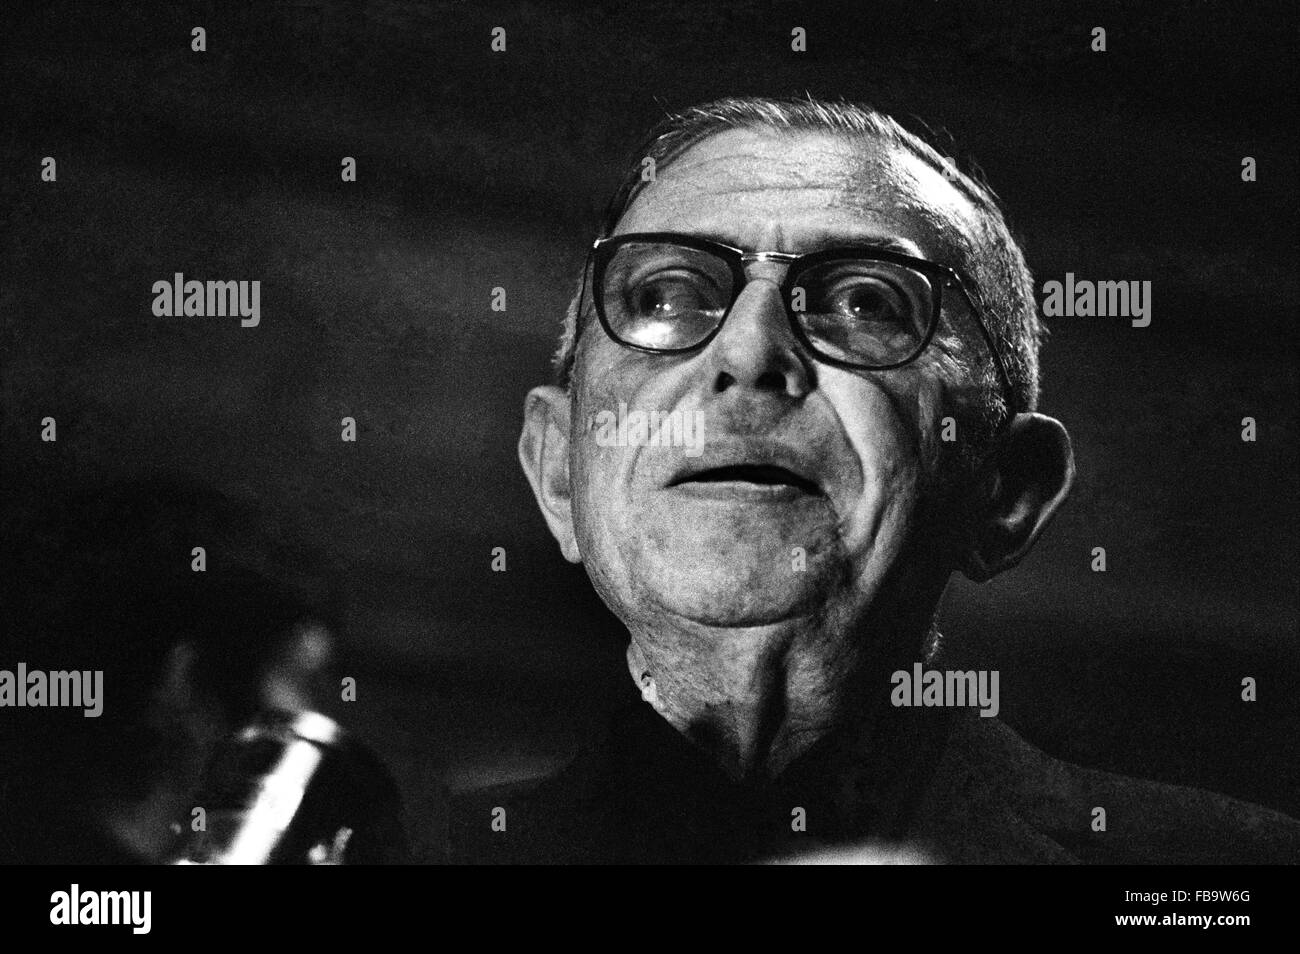 Jean-Paul Sartre a 'la Sorbonne' - 1968 - Francia / Ile-de-France (Regione) / Parigi - Jean-Paul Sartre Immagini Stock